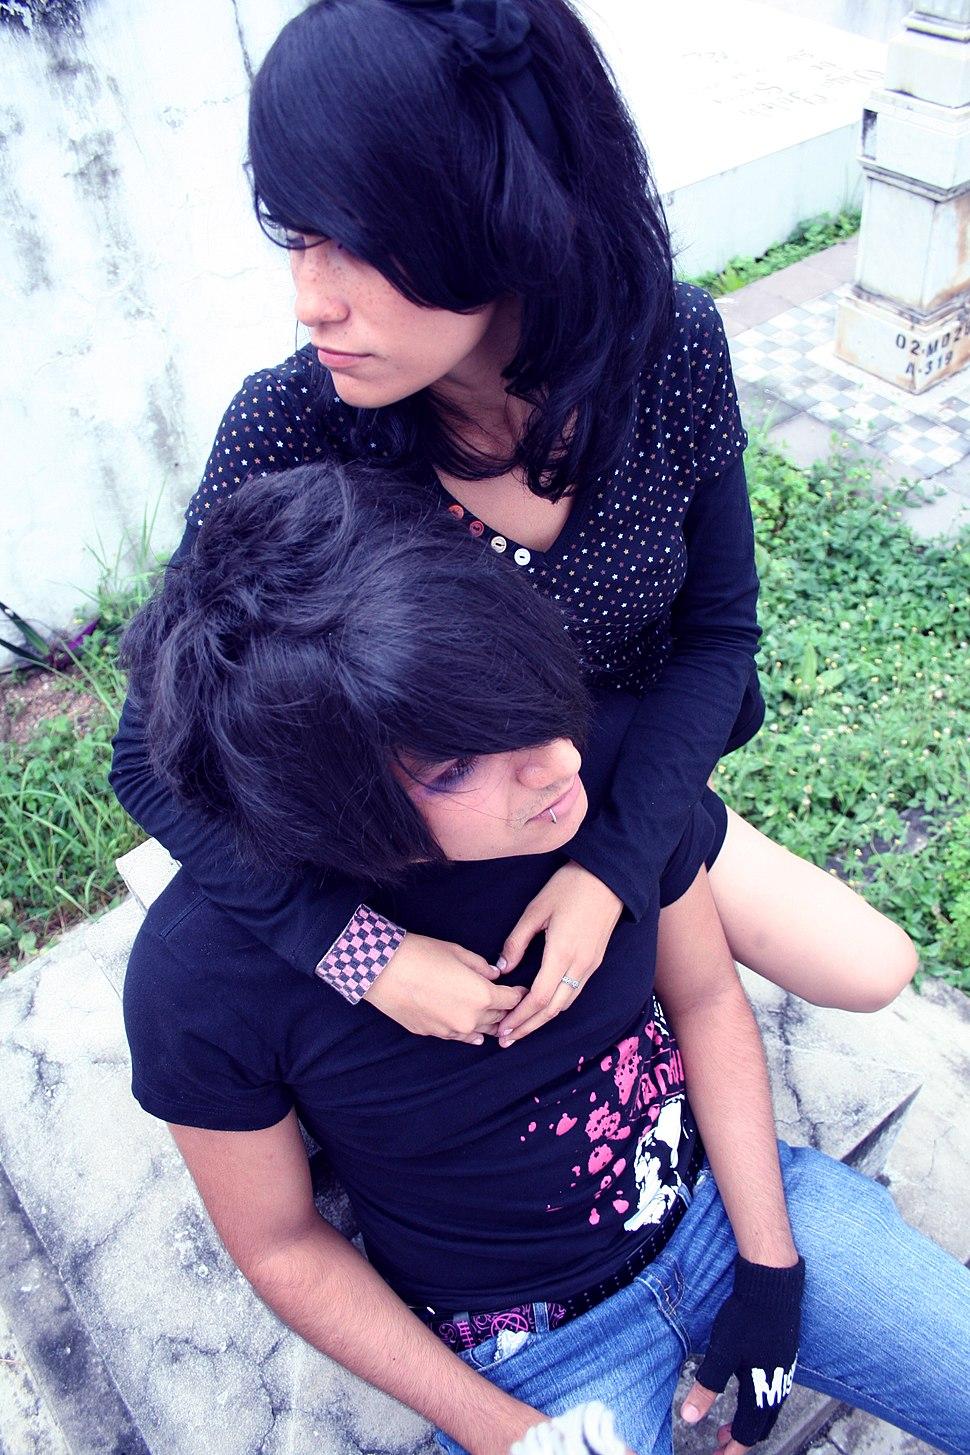 Emo boy 02 with Girl